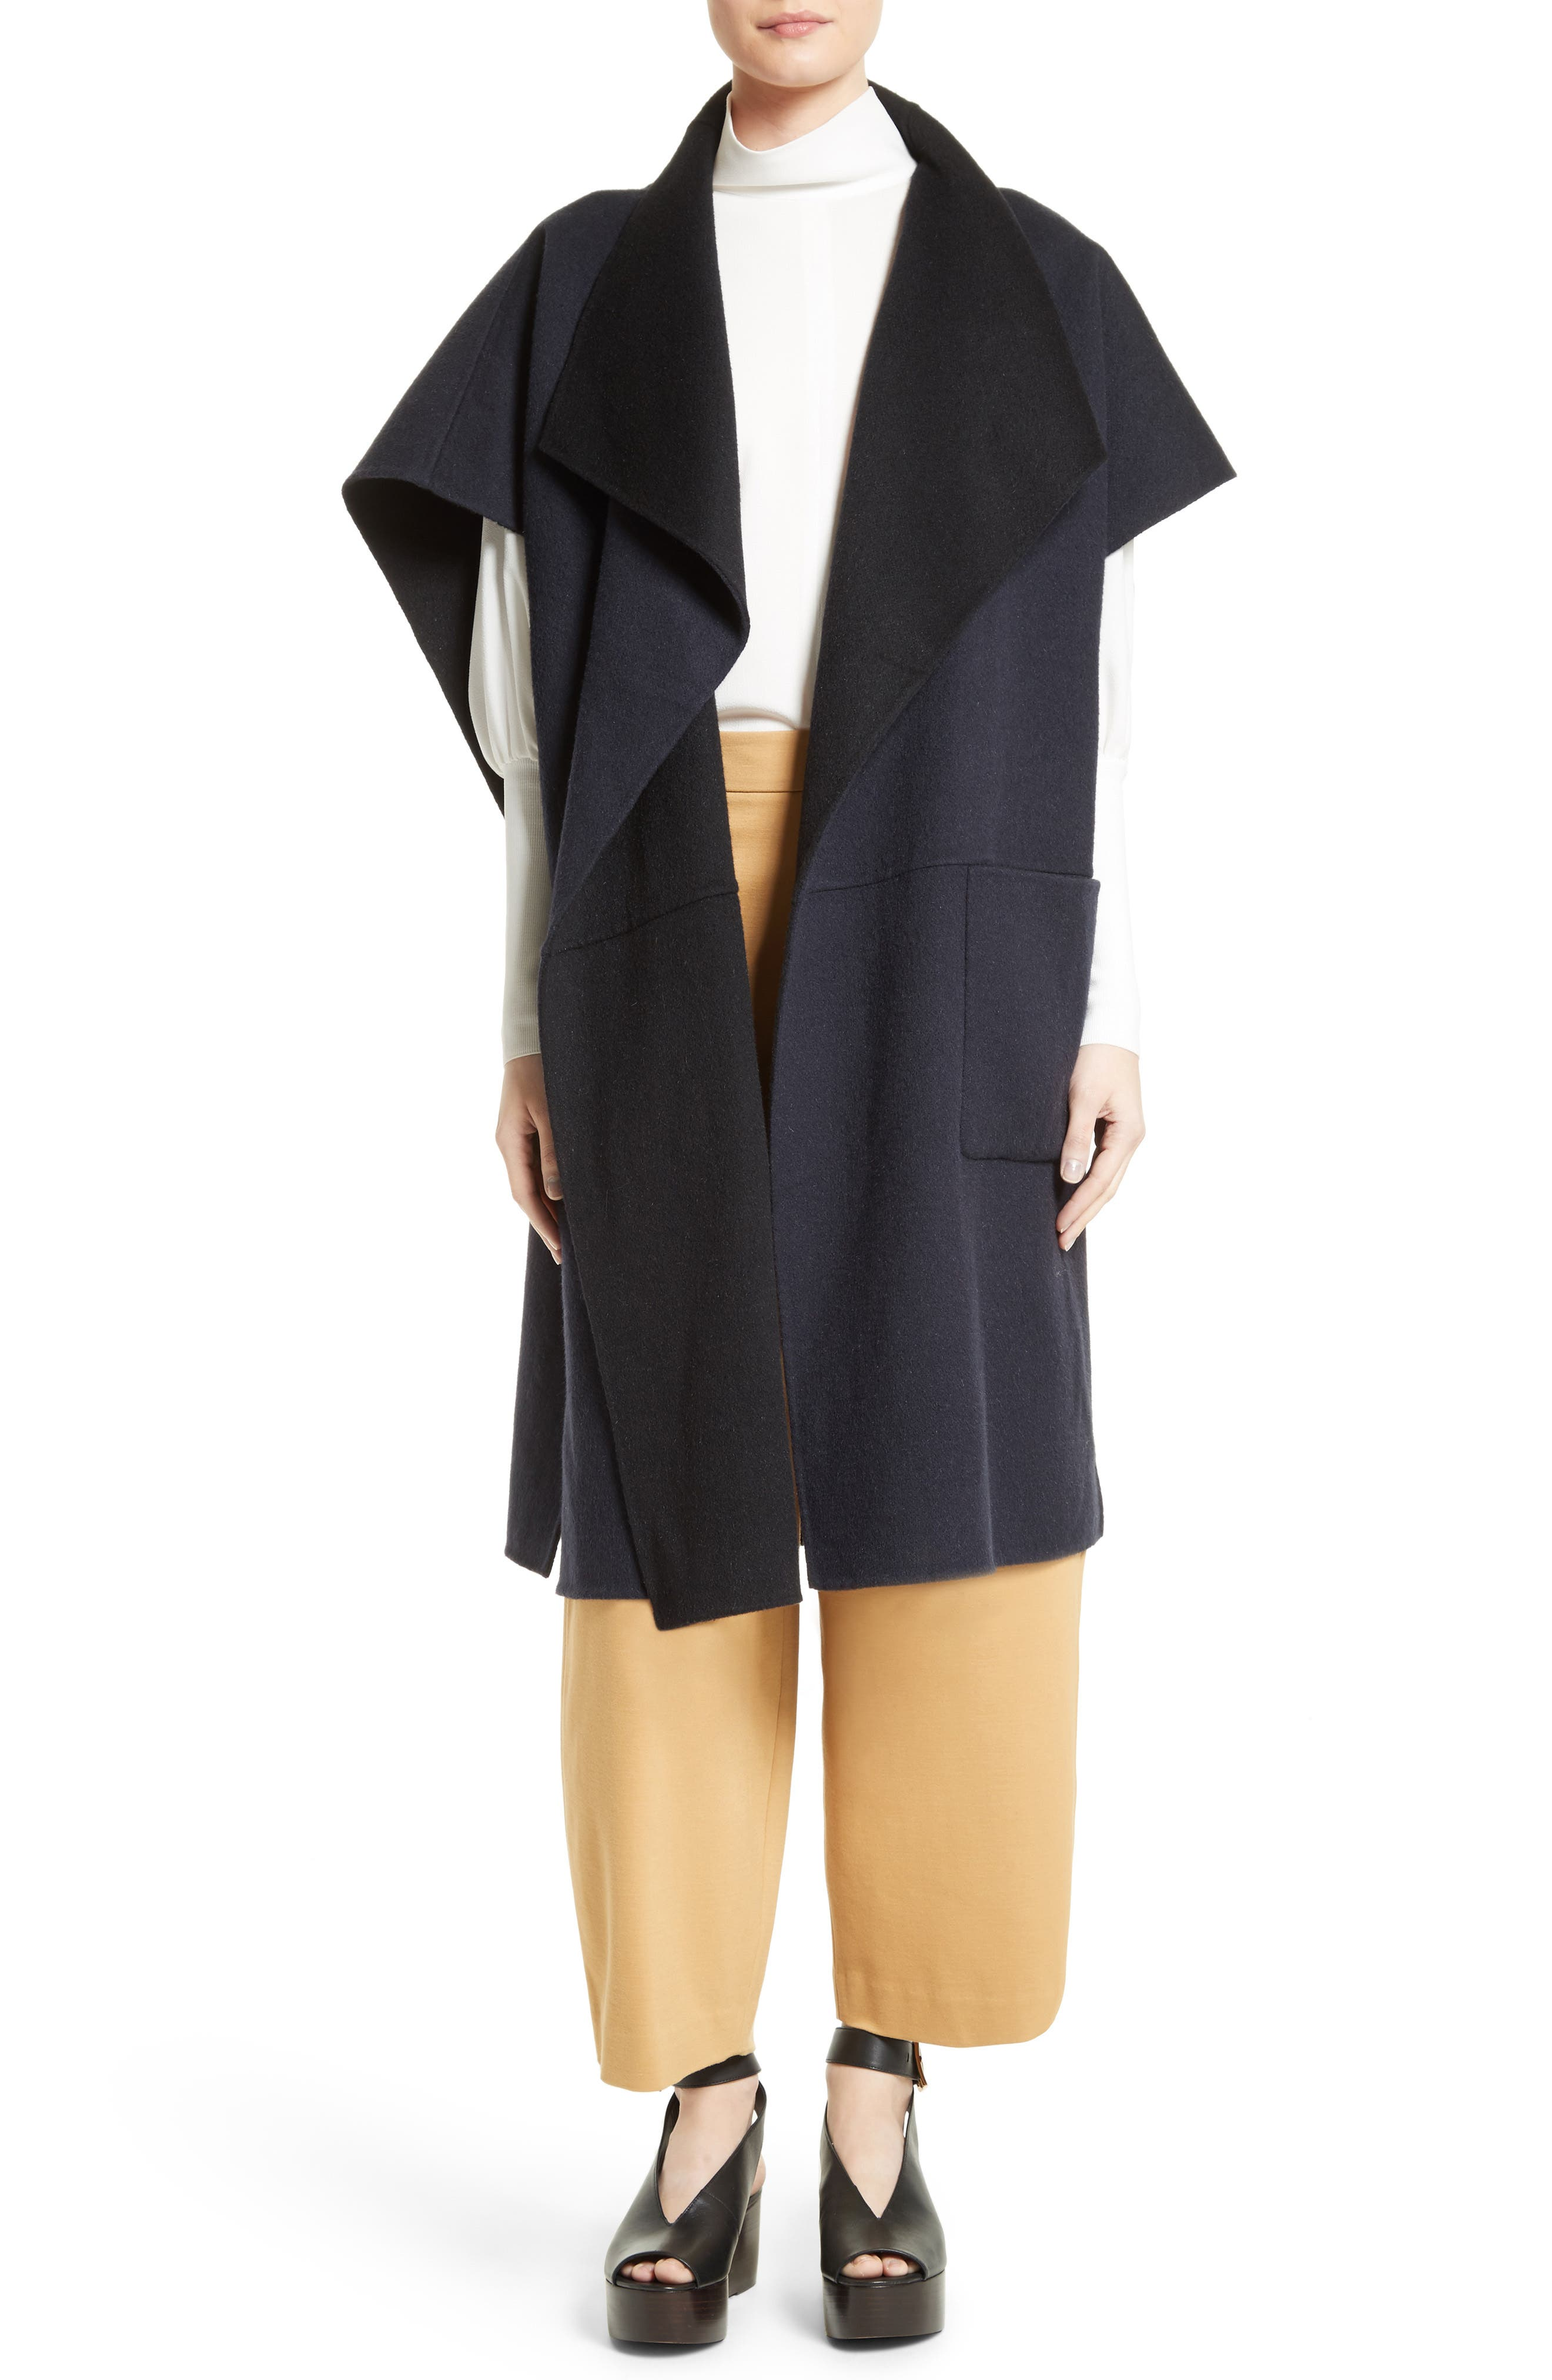 Tibi Wool & Angora Reversible Cape